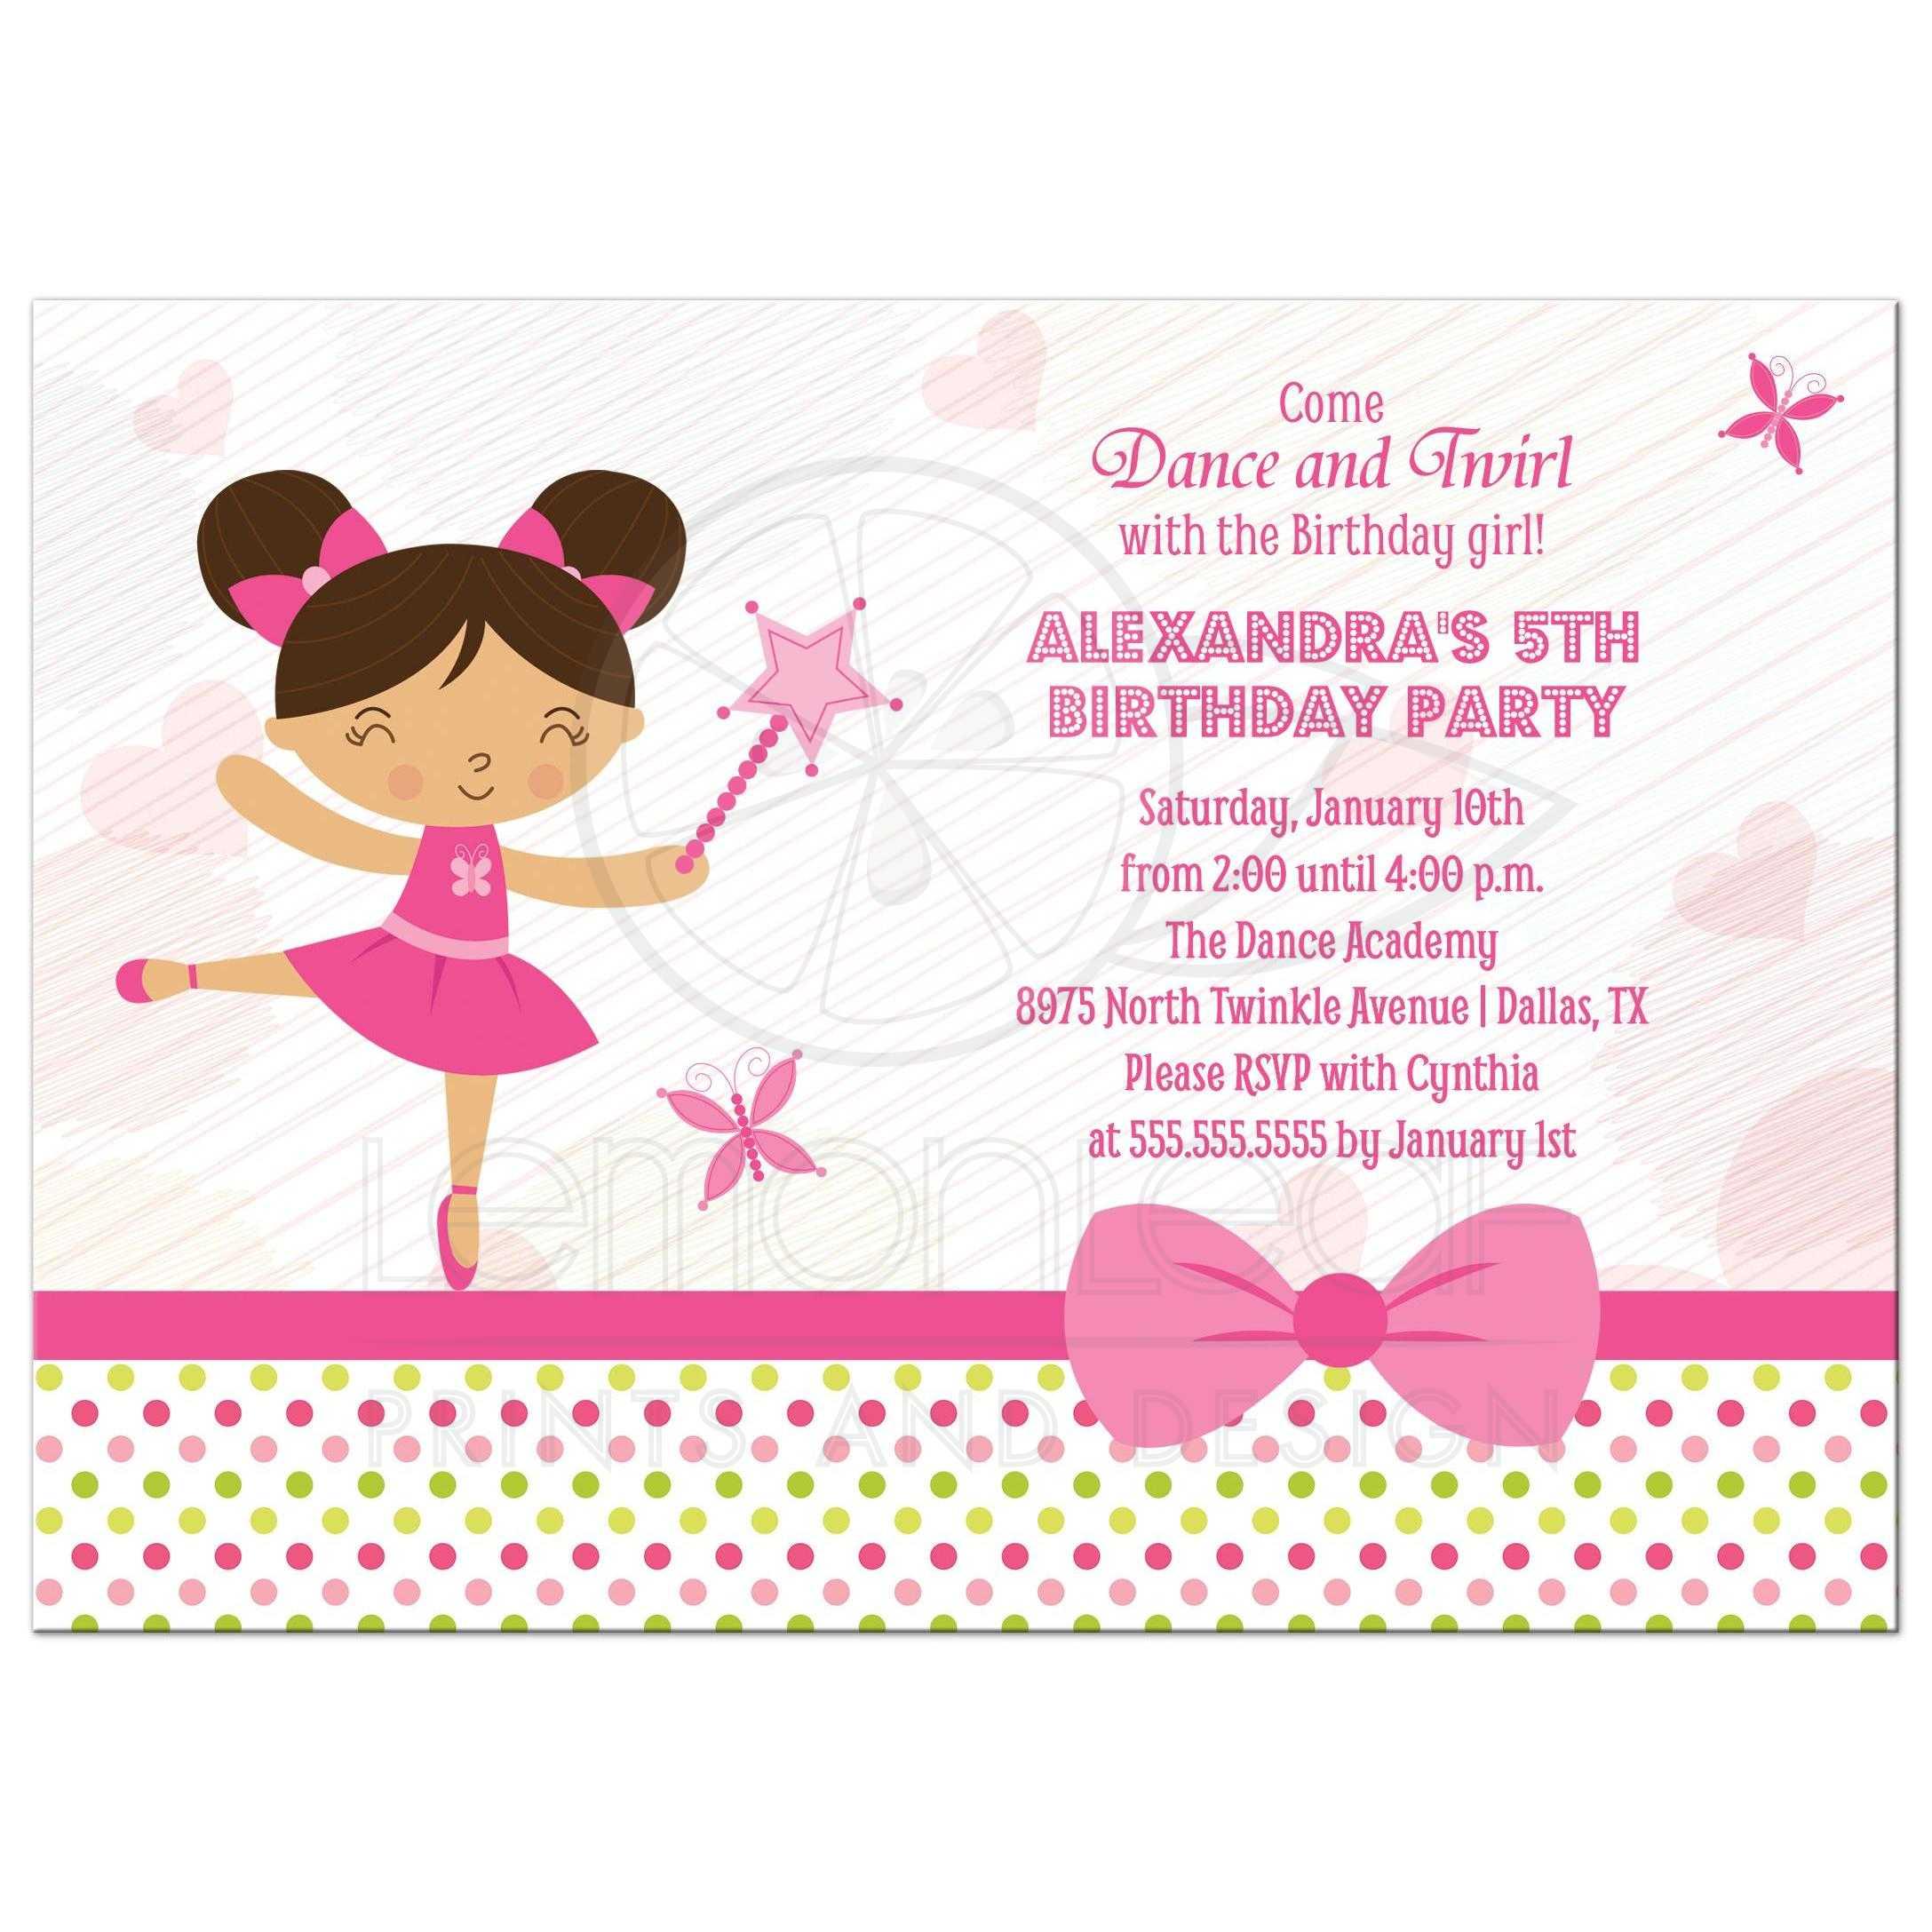 Birthday Party Invitation - Girls Pink Ballerina Fairy - Brown Hair